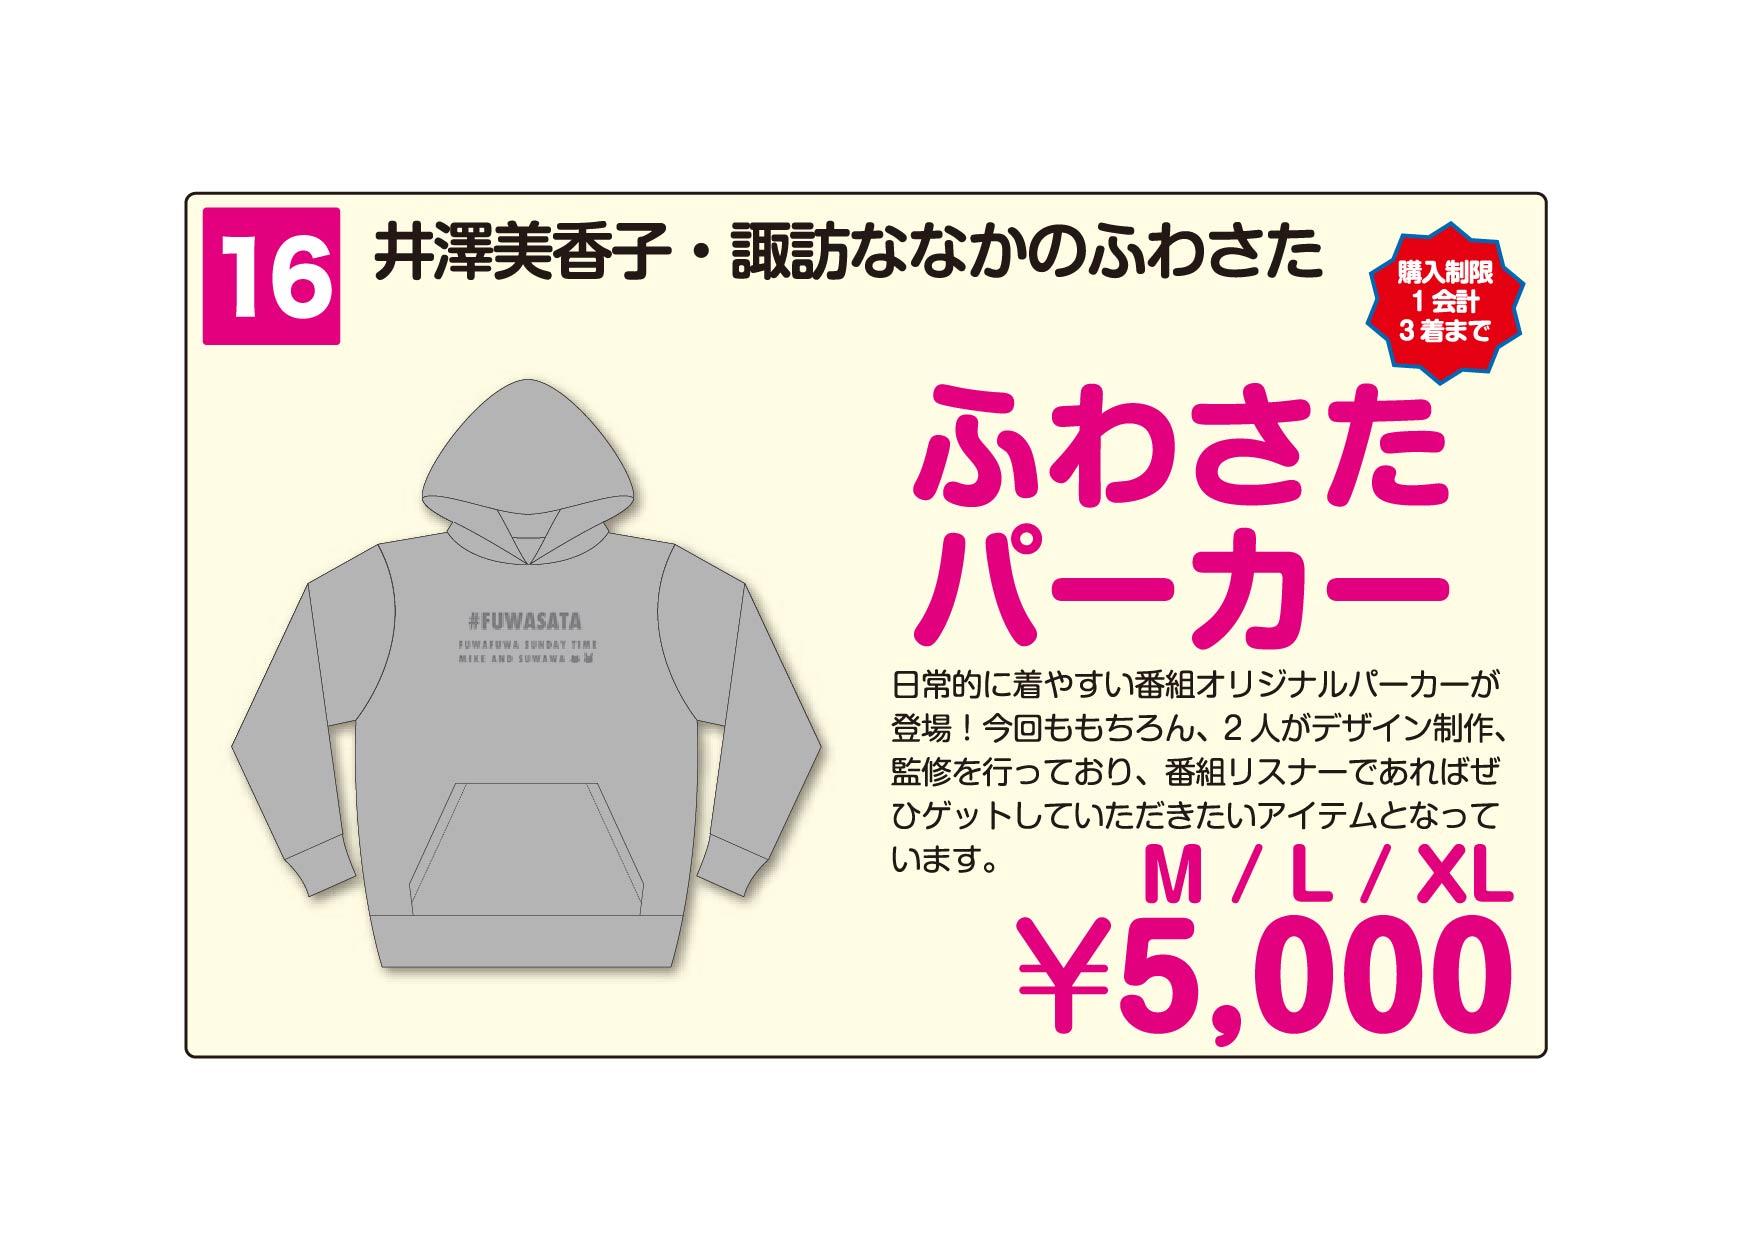 http://www.joqr.co.jp/AandG_booth/16.jpg